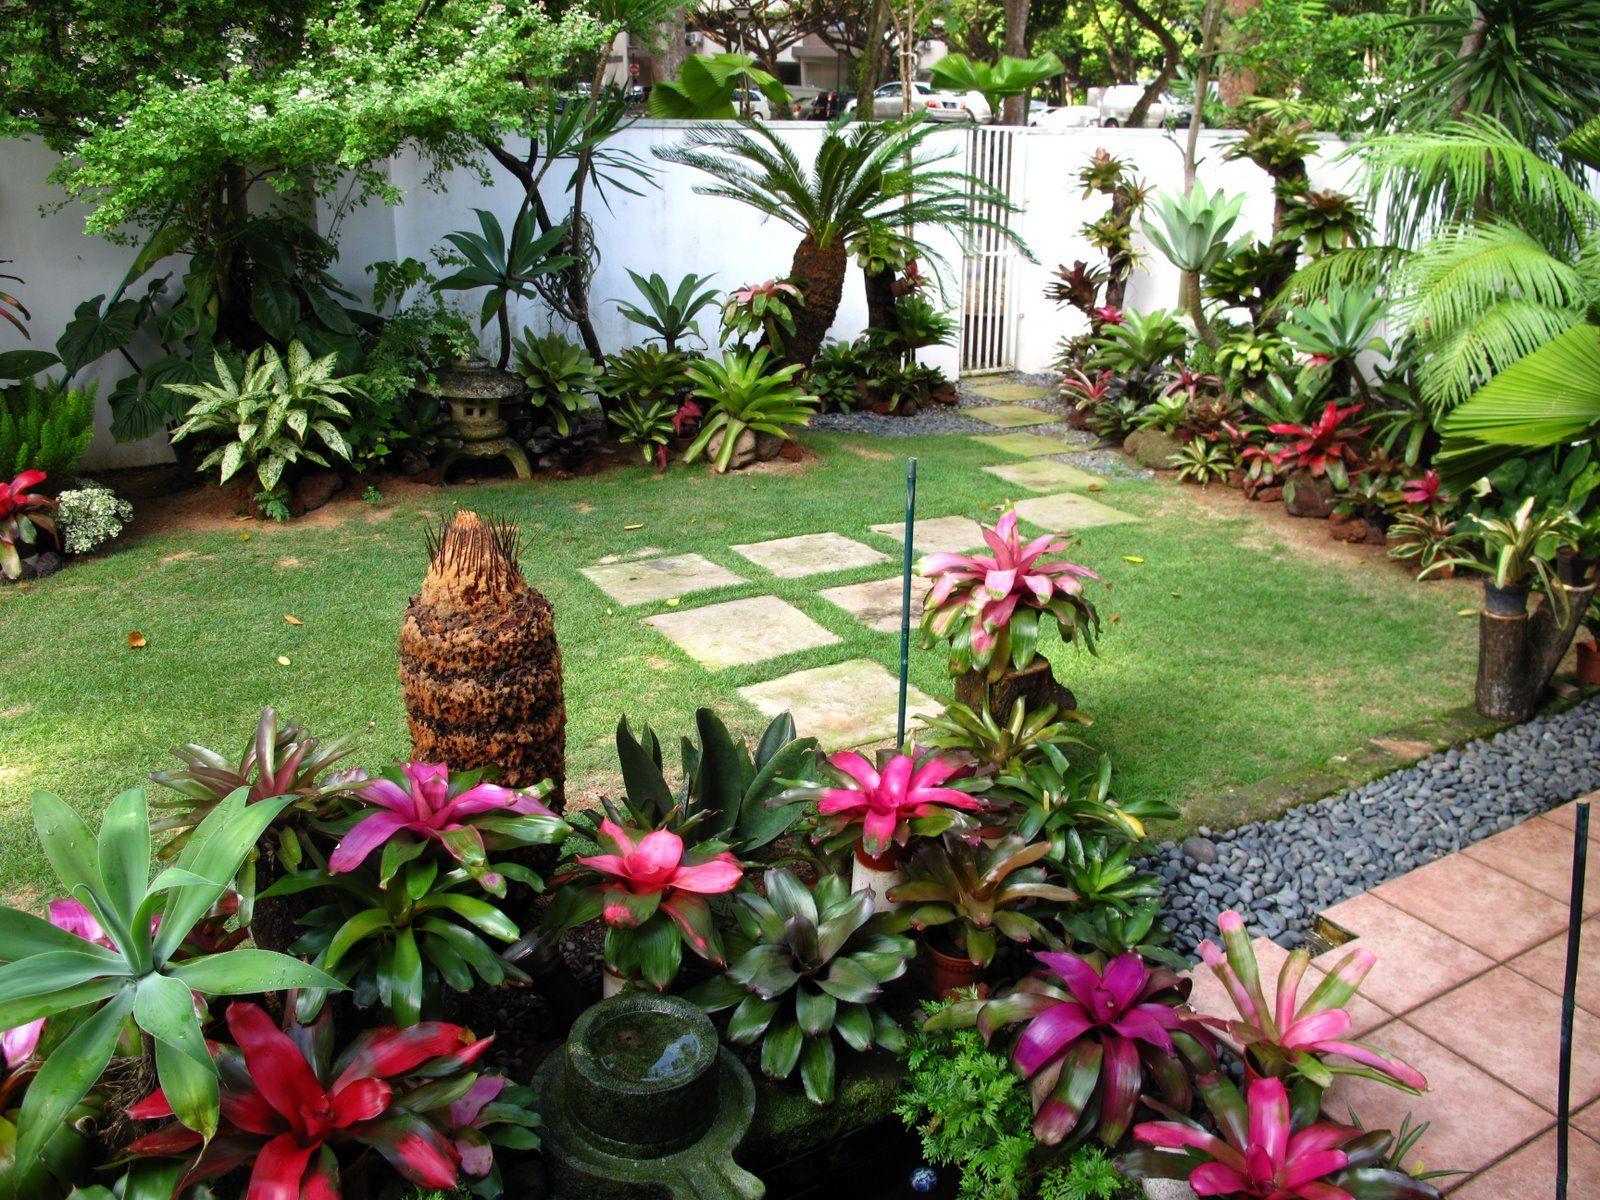 Prarlu0026#39;s bromeliad garden Singapore from journey through paradise bromeliads | Garden design ...